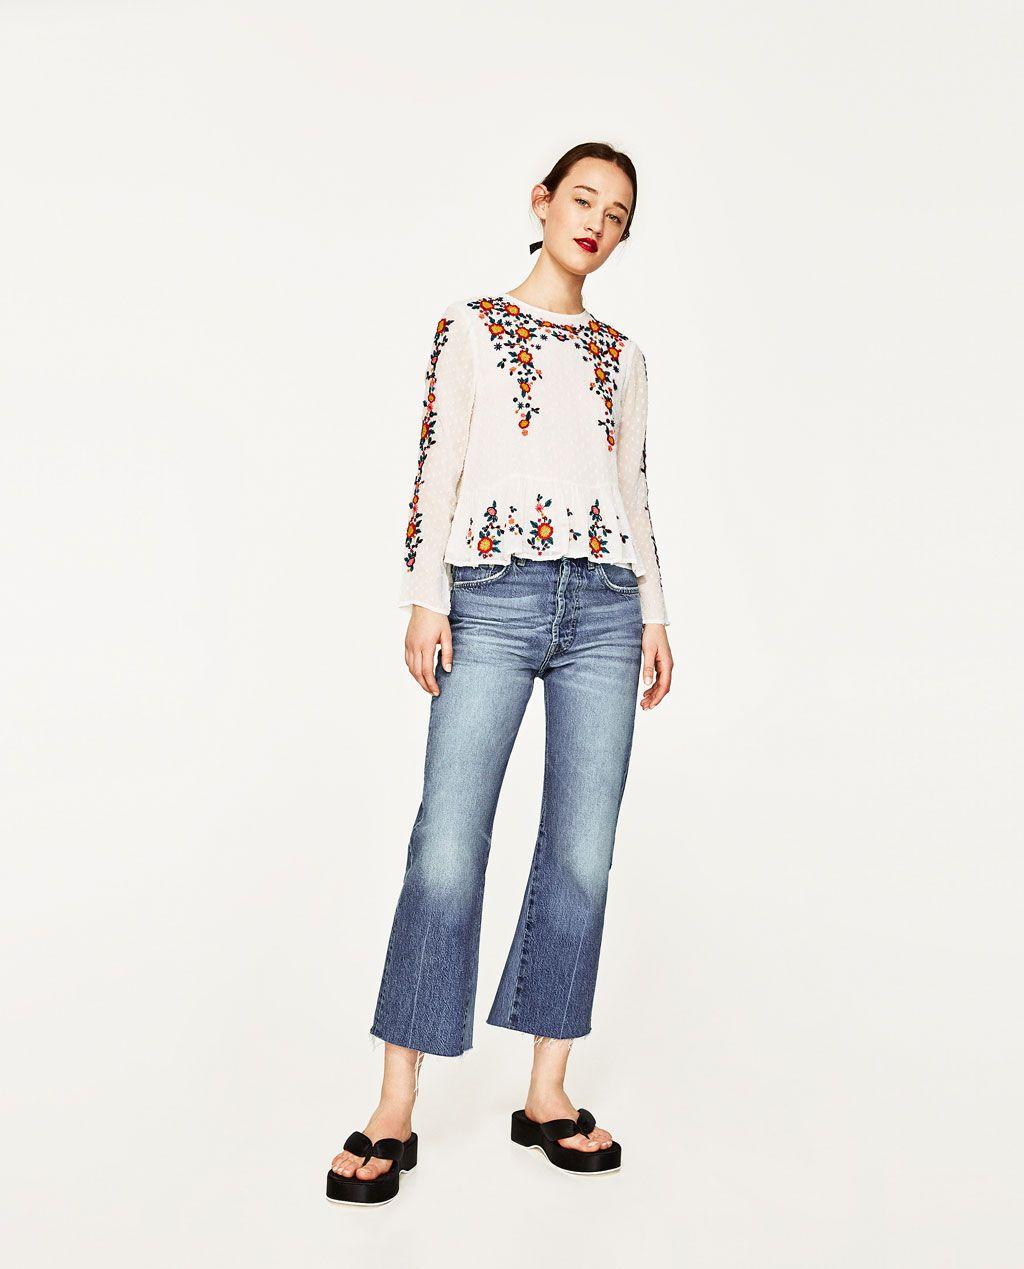 03dec6d9 ZARA - WOMAN - EMBROIDERED PLUMETIS BLOUSE Zara Women, All About Fashion,  Blue Jeans